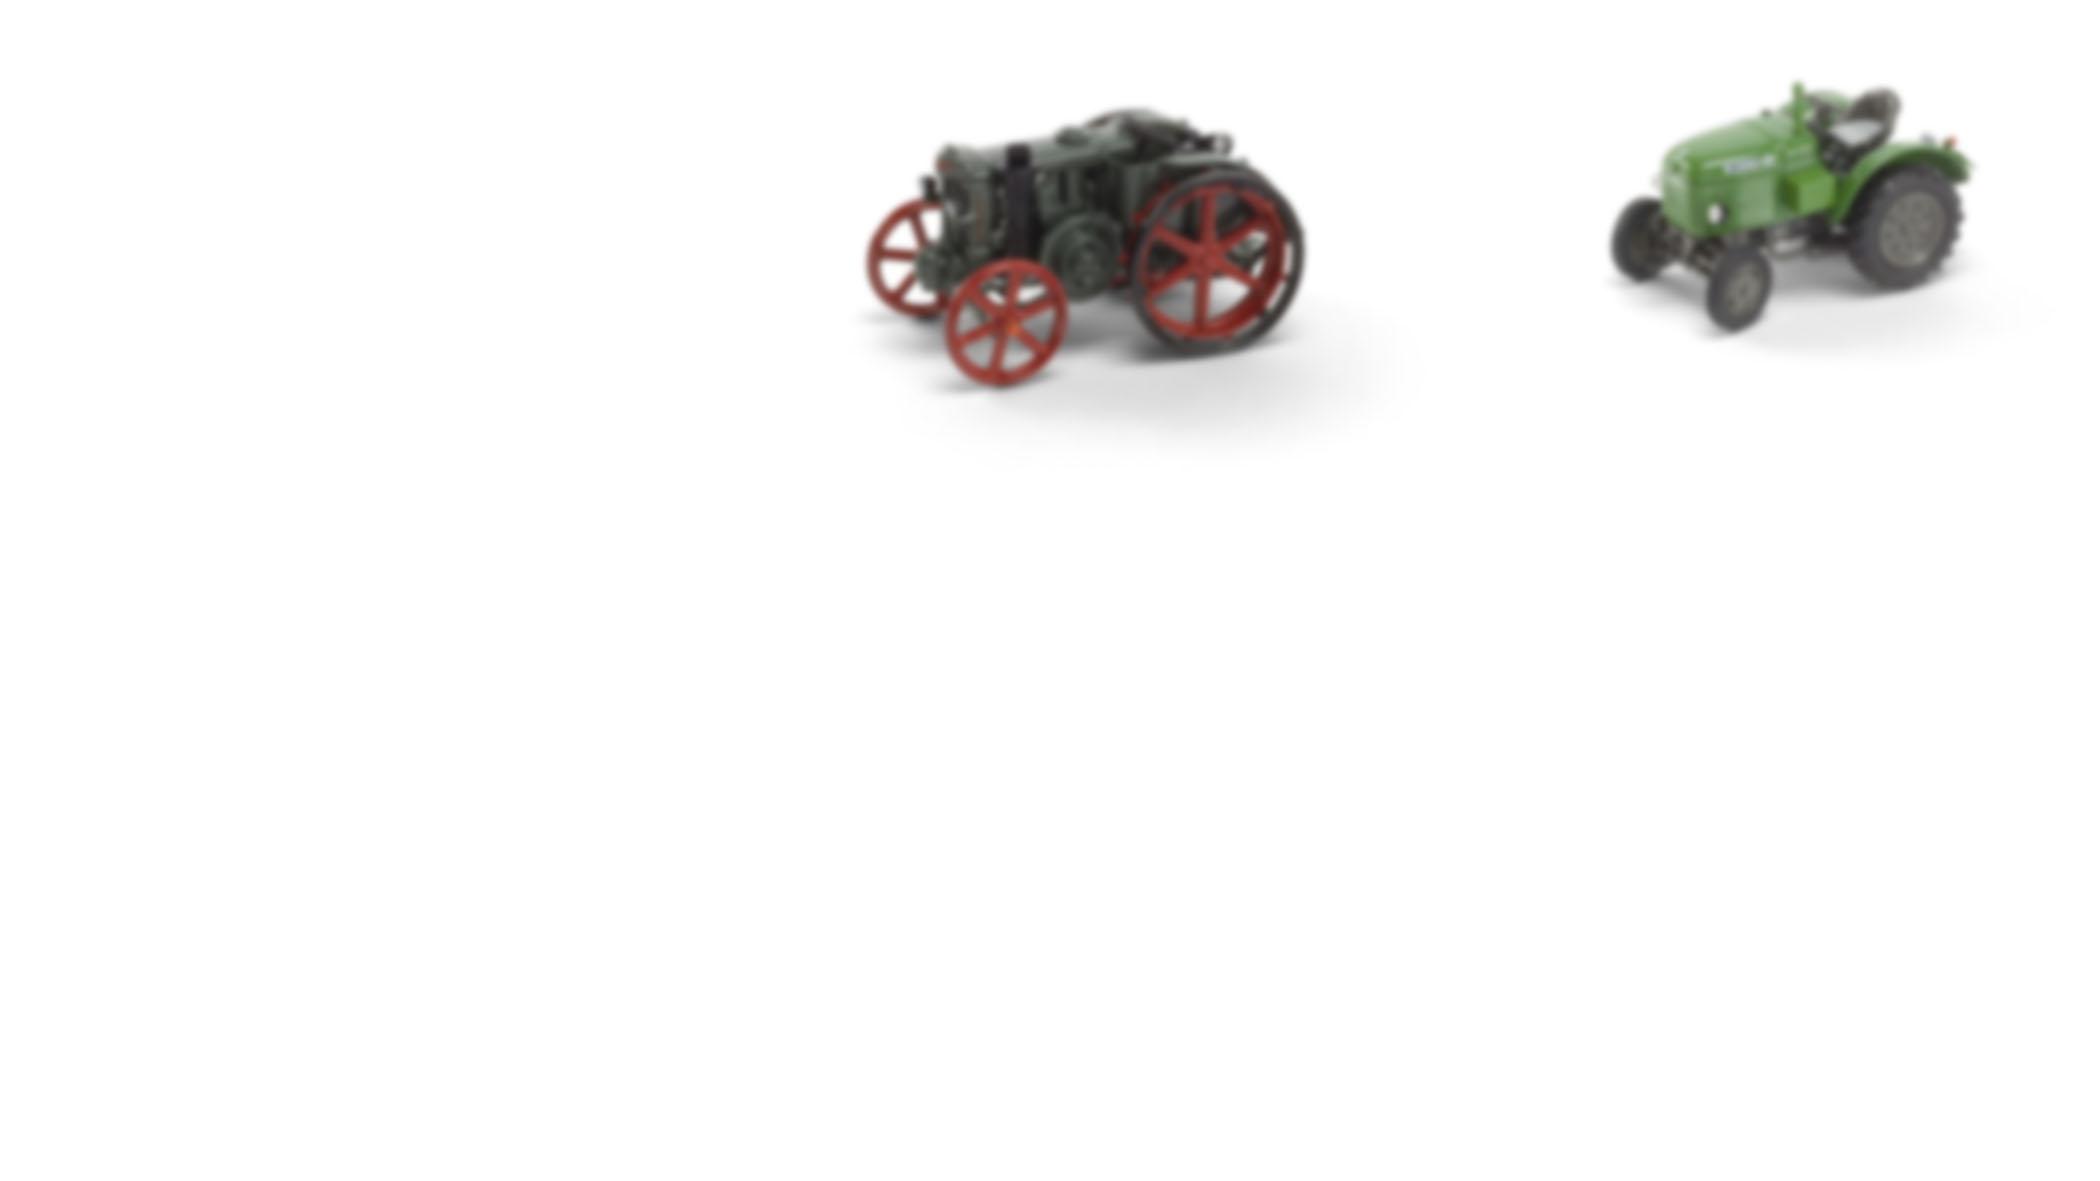 Produttore di modellini di trattori classici di altissima qualità